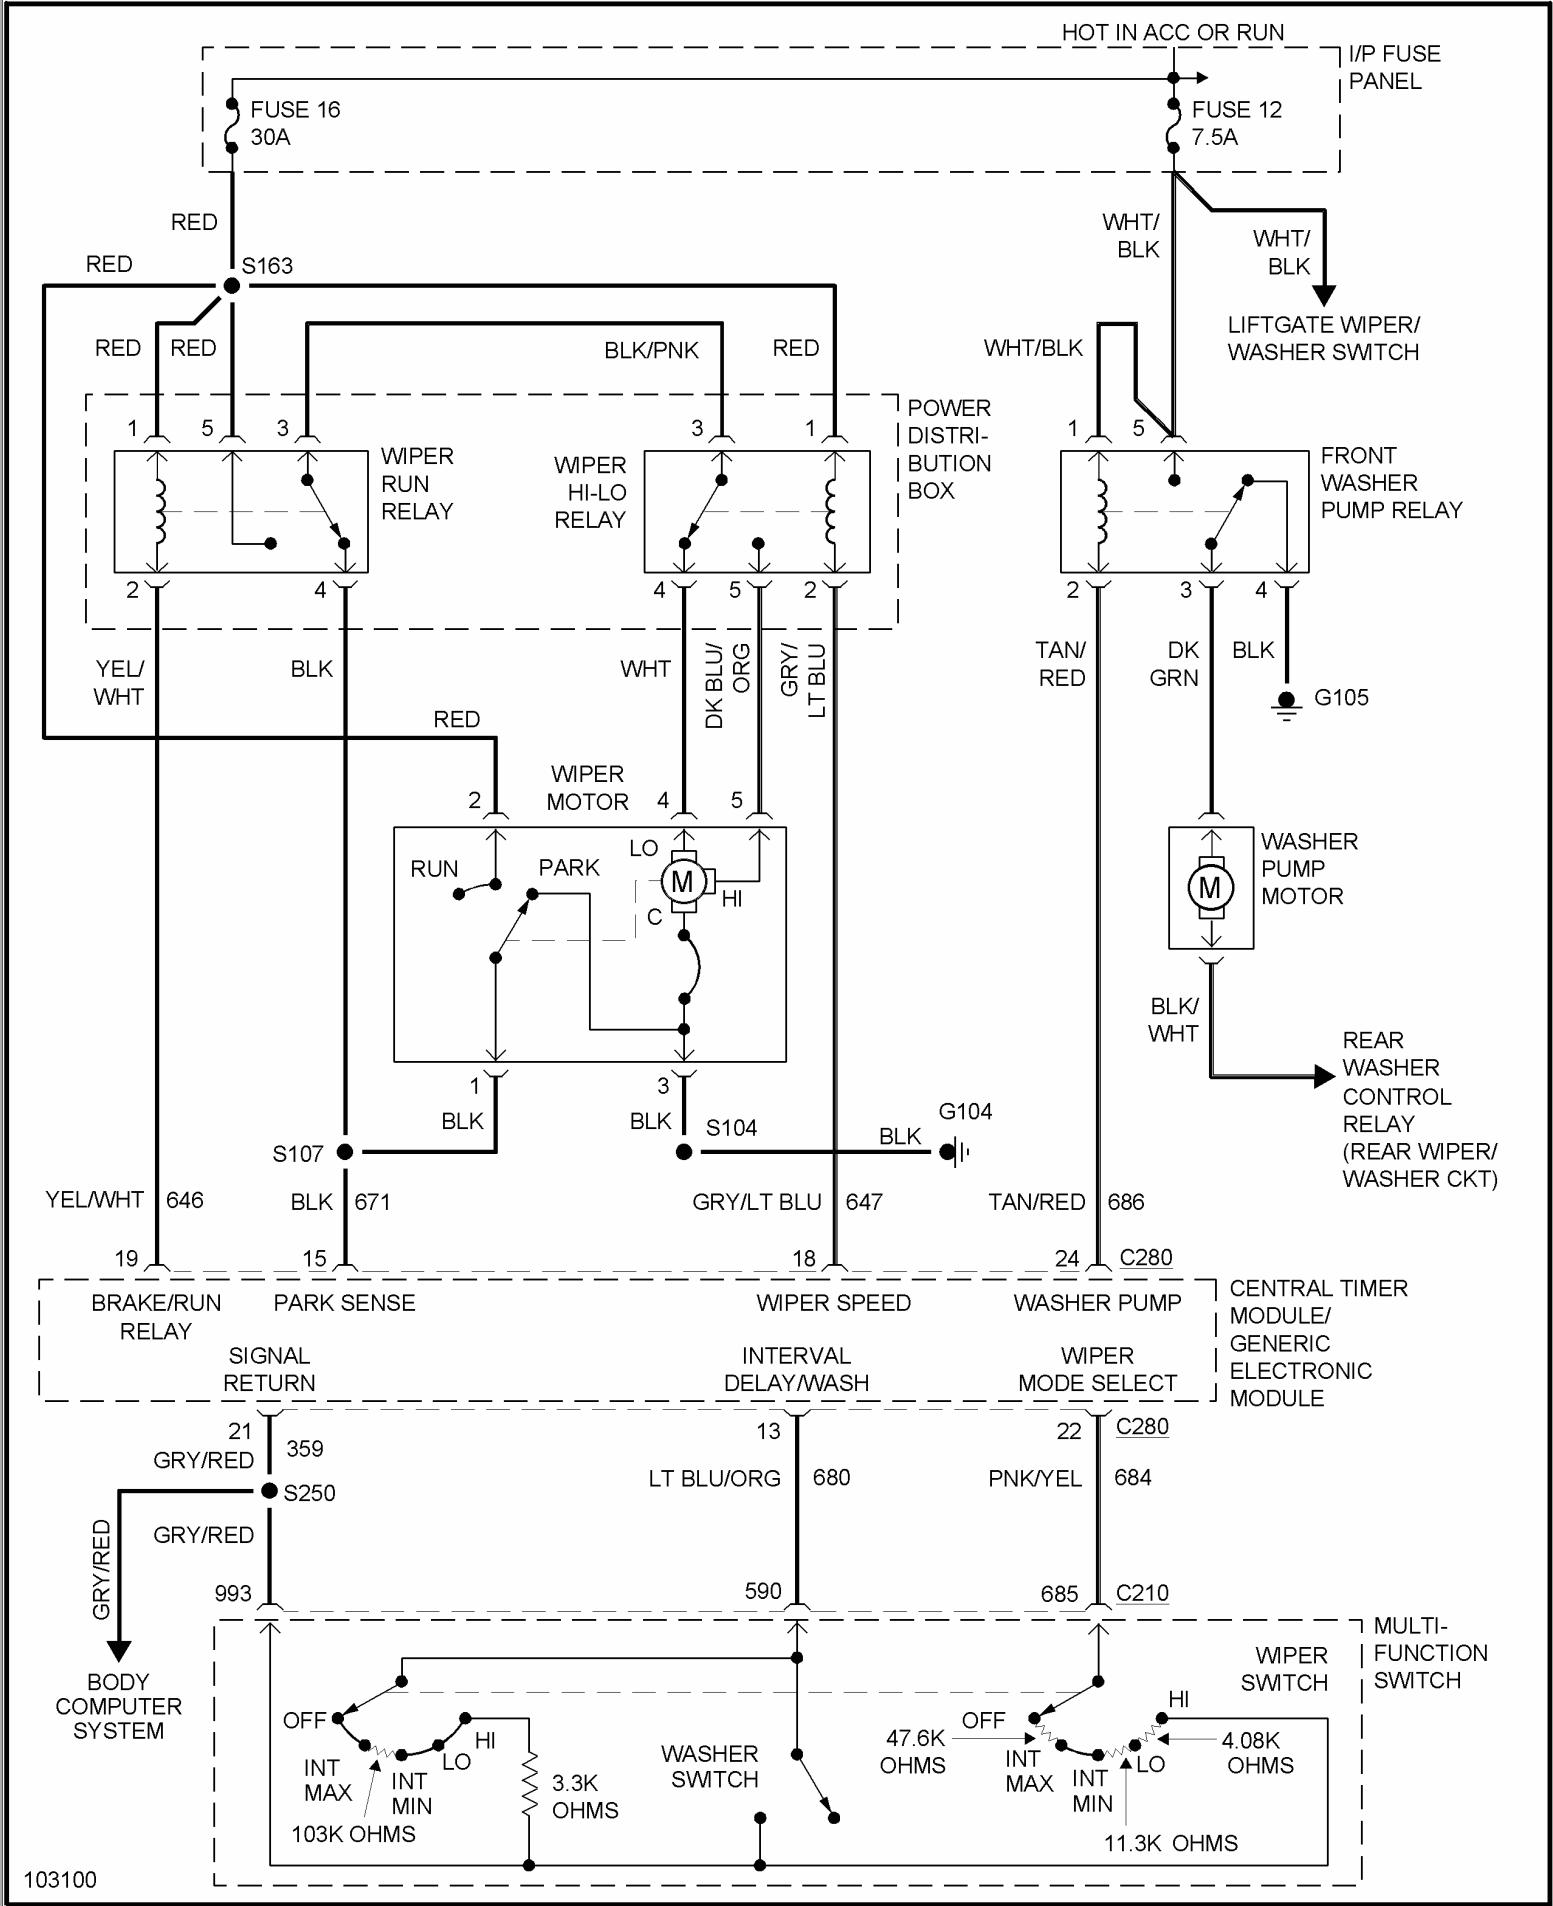 Windshield Wiper Motor Wiring Diagram Mazda Navajo Wiring Diagrams Img Random A Random A Farmaciastorelli It